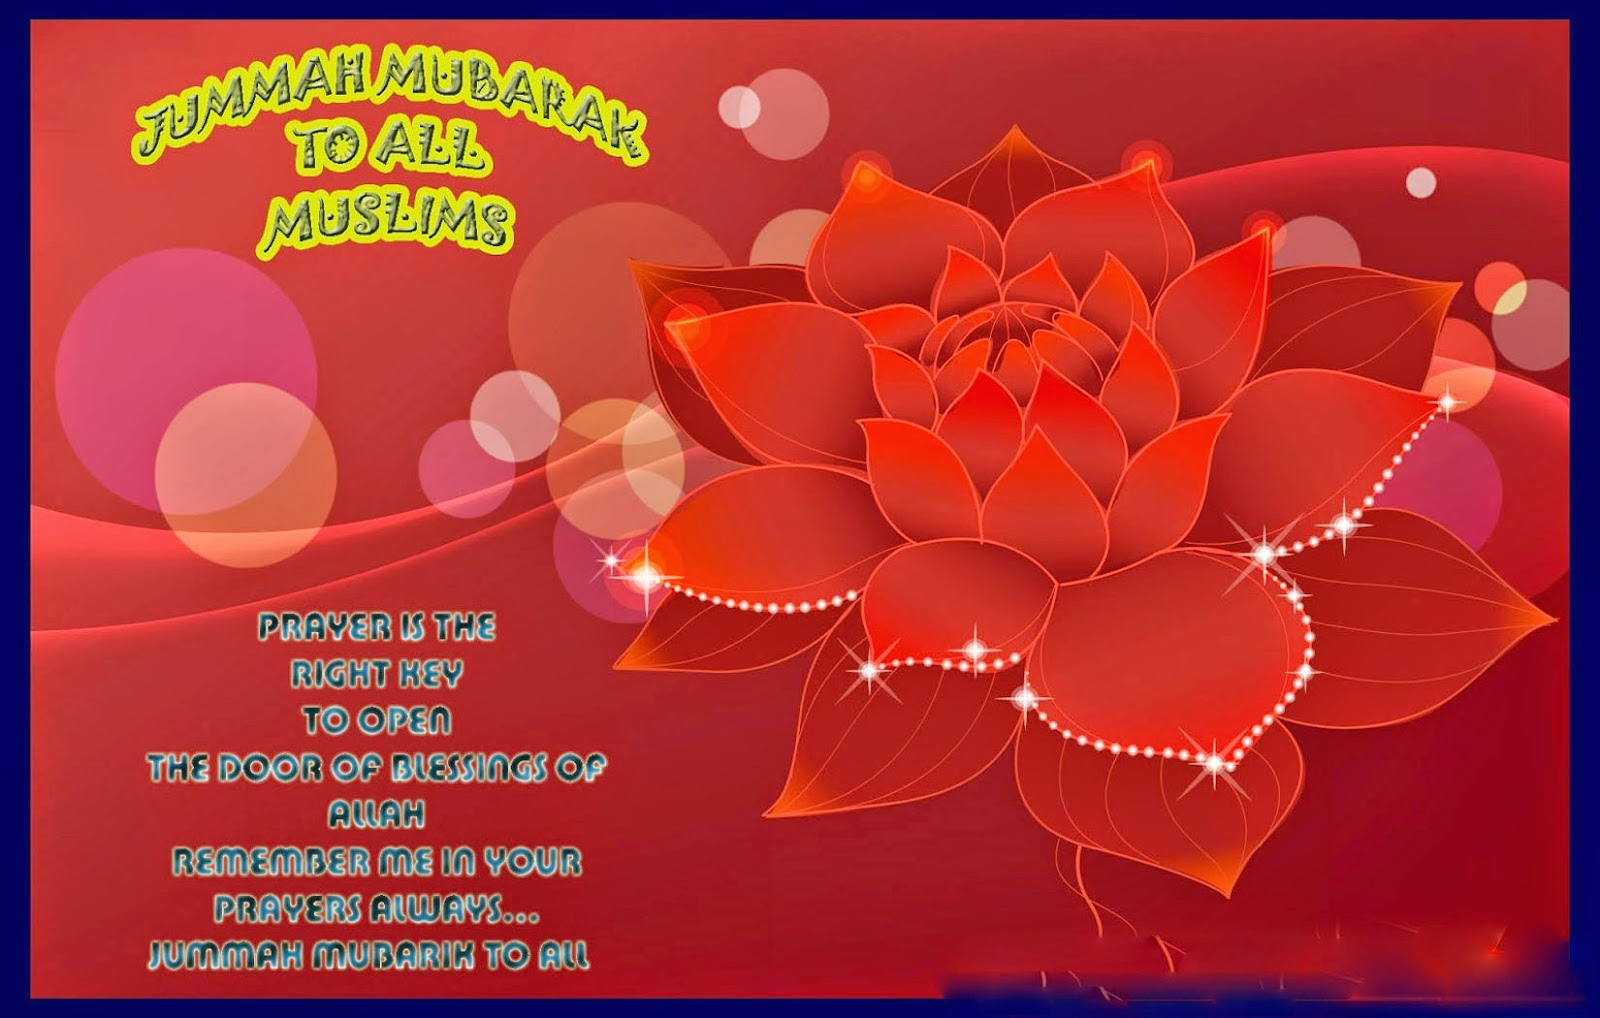 Jumma mubarak 2014 wallpaper download unique wallpapers jumma mubarak card and greetings m4hsunfo